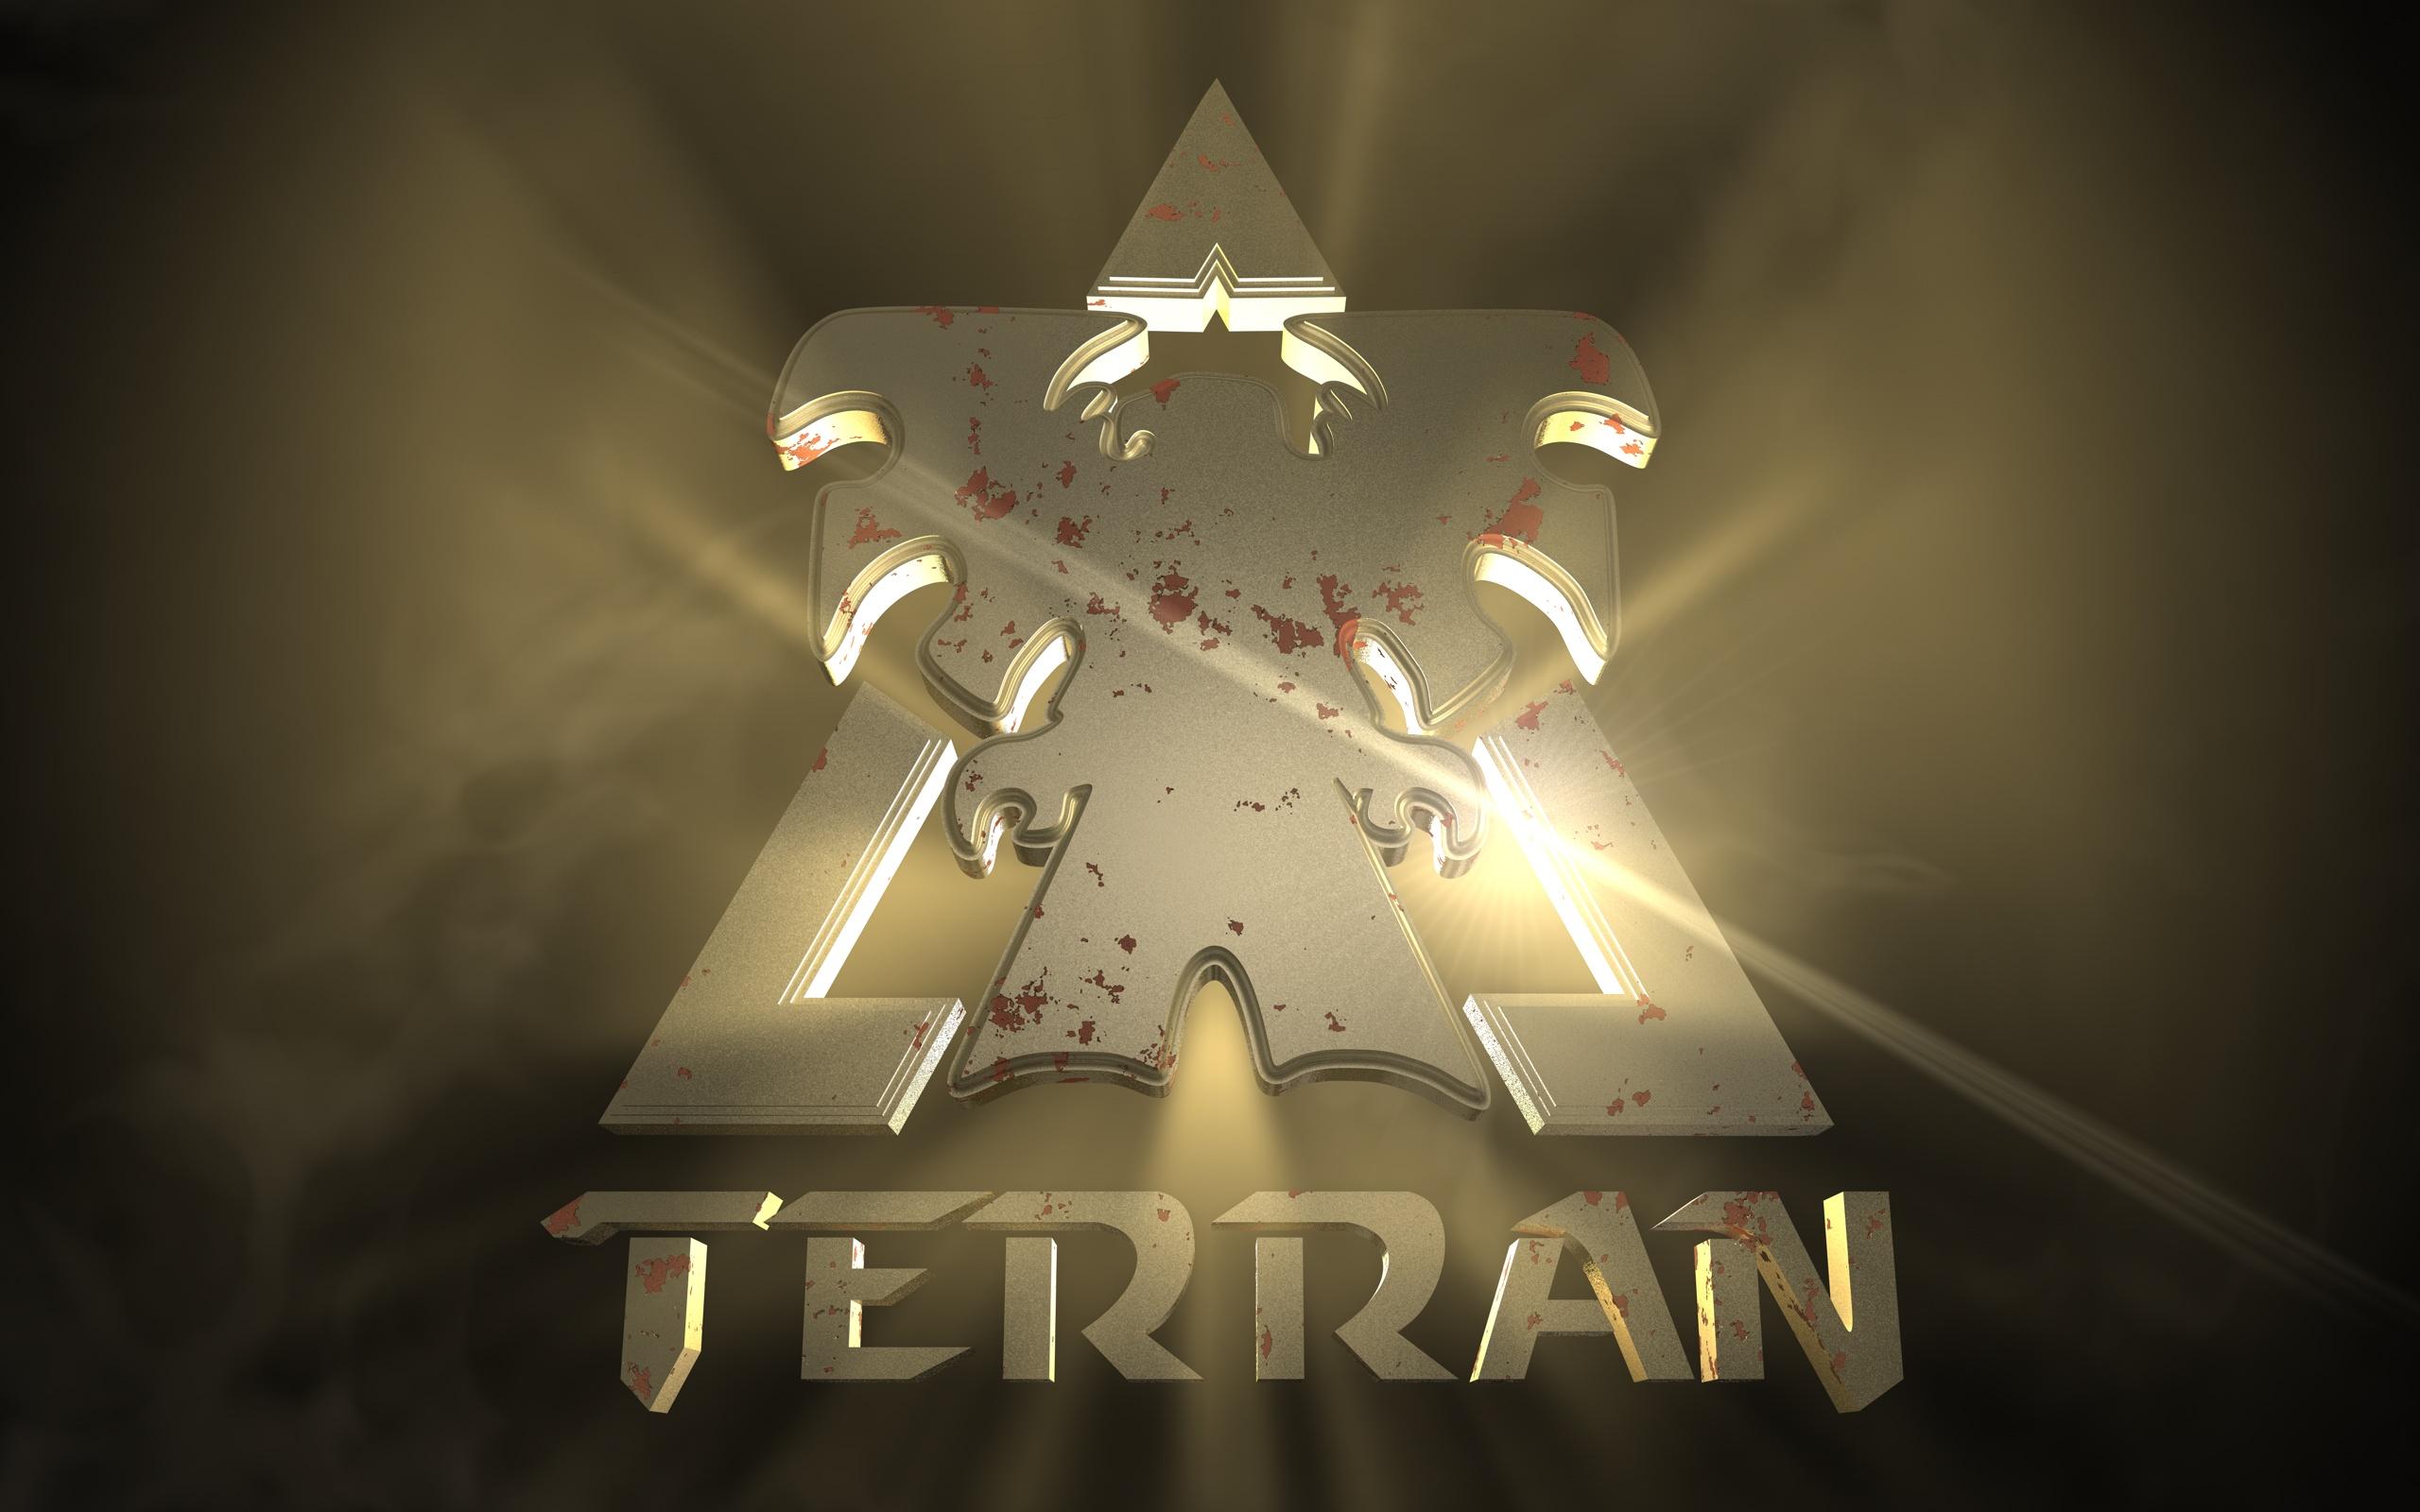 Starcraft 2 Iphone Wallpaper Terran S Logo Hd Wallpaper Background Image 2560x1600